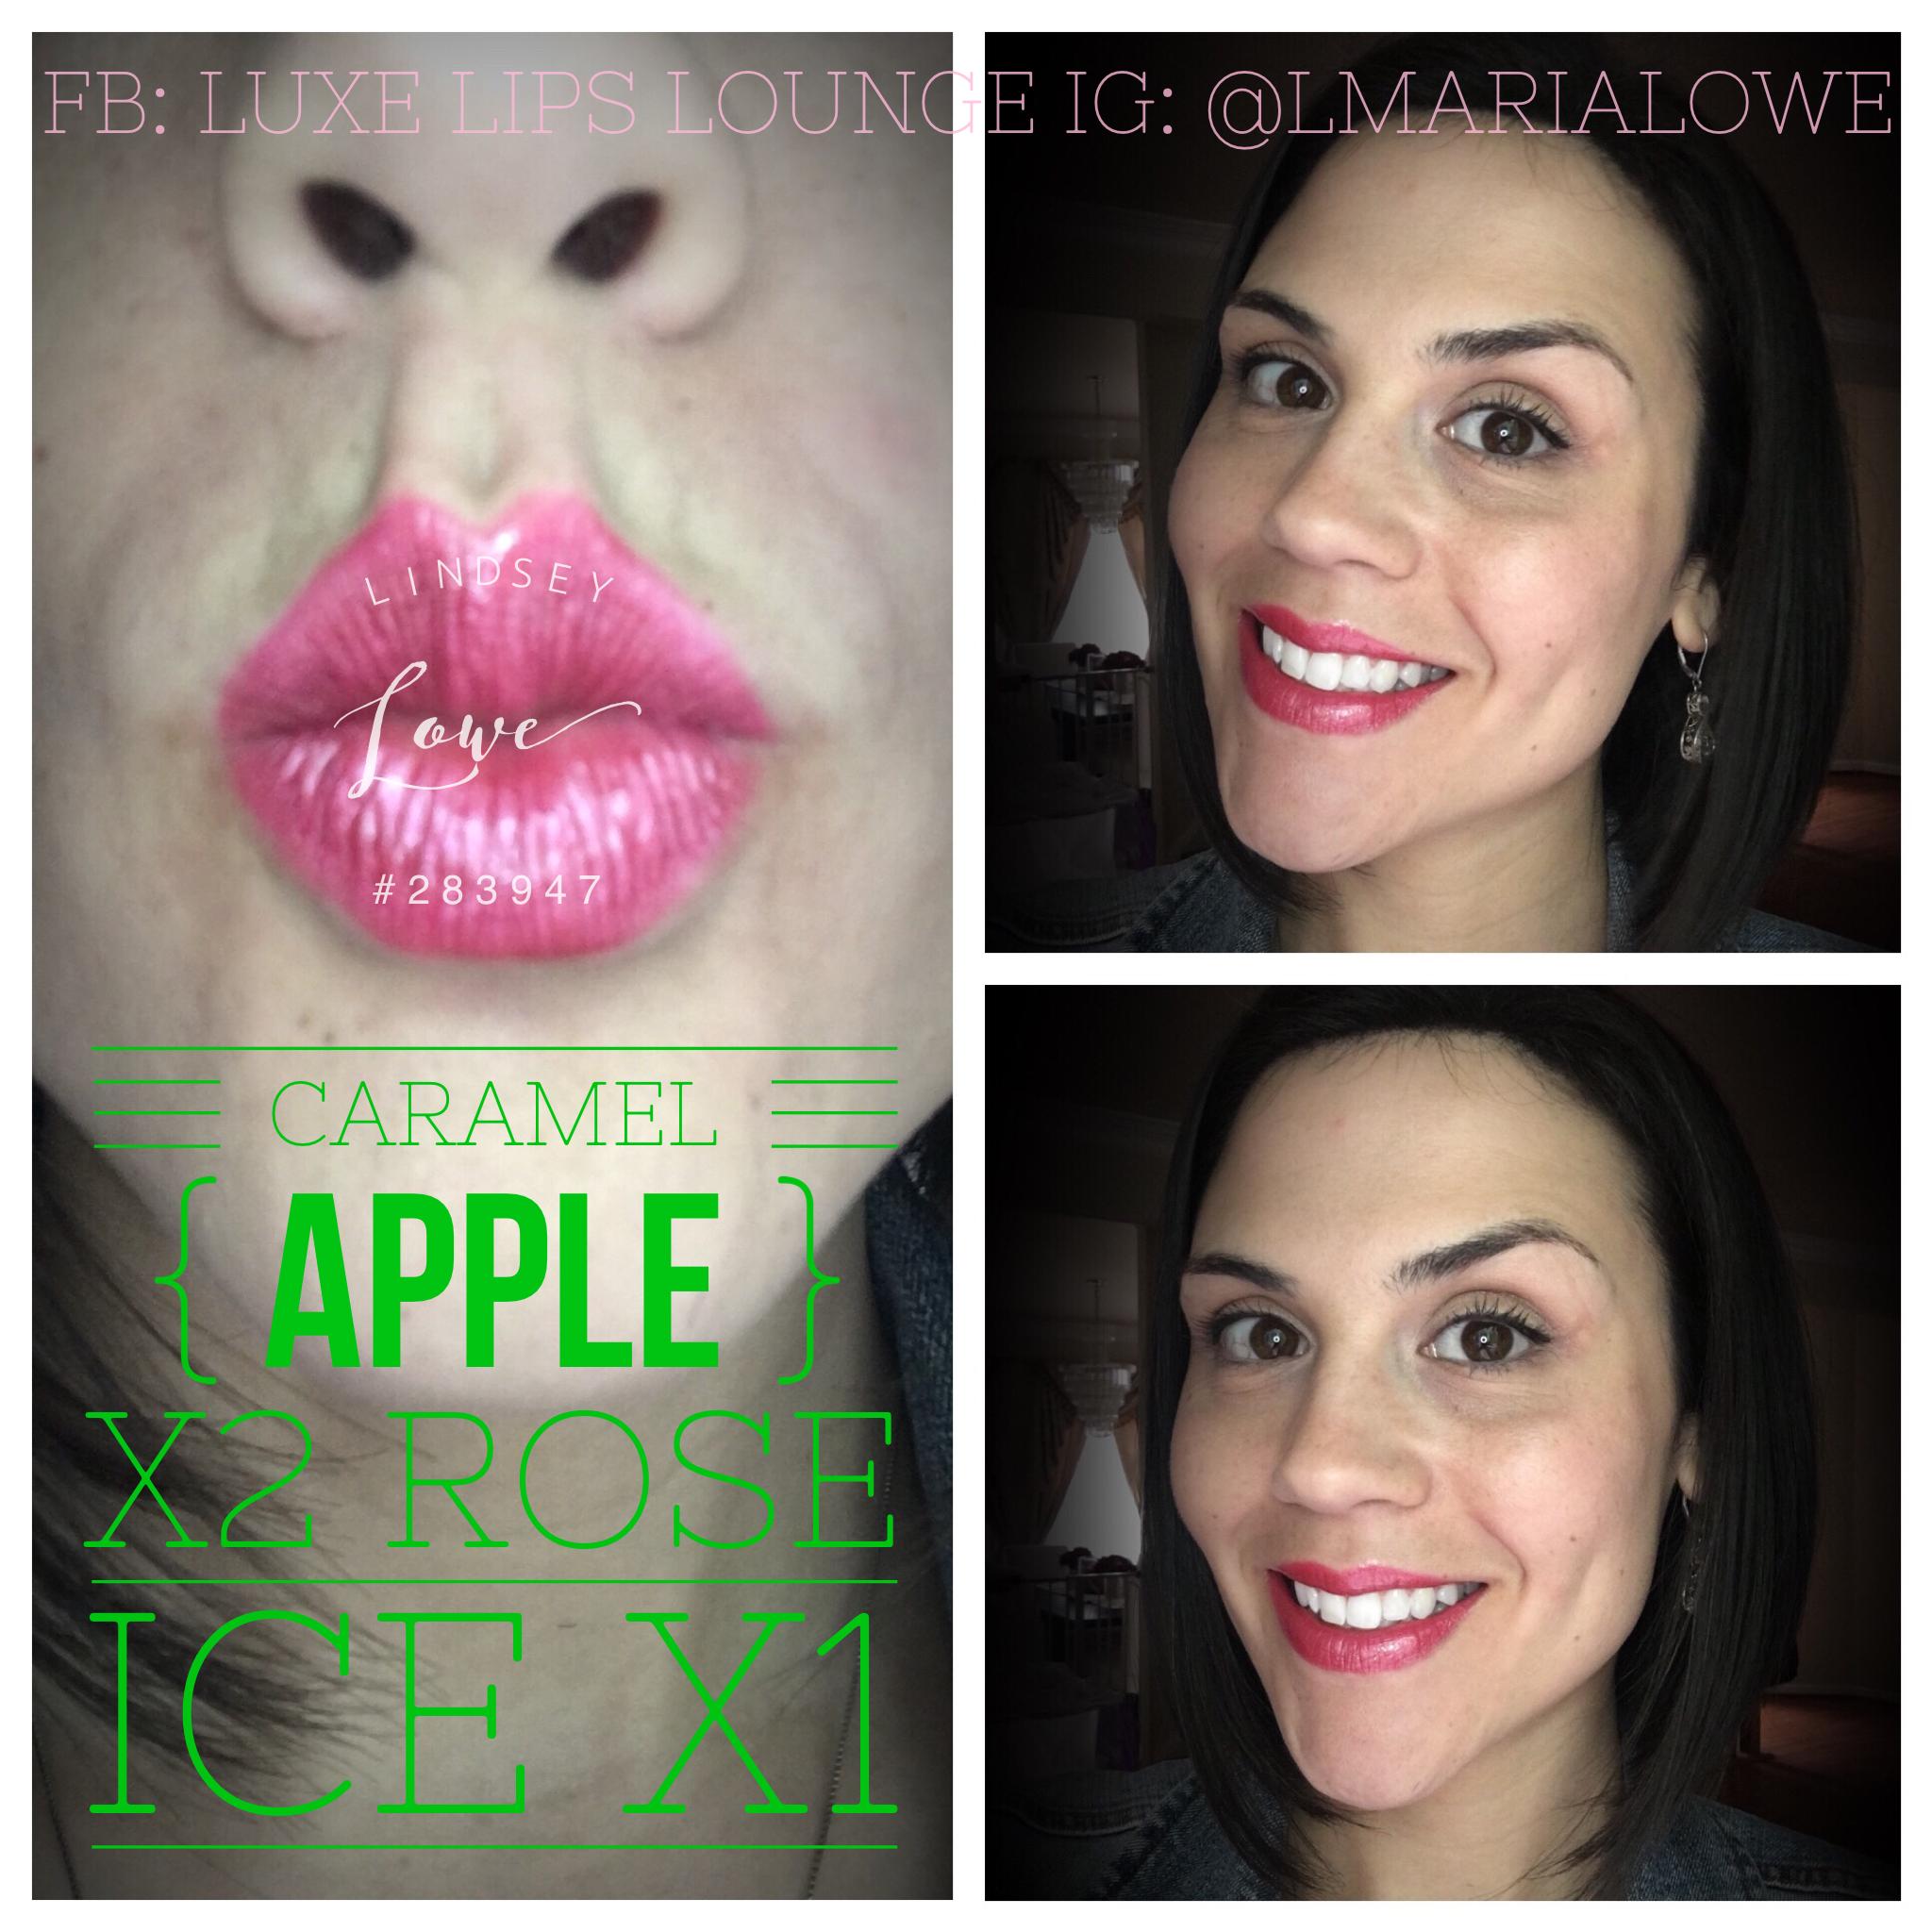 #pretty #spring #pink 💄💙💕 #coloroftheday #caramelapple #roseice #love #fun #makeup #play #mybusiness #hustle #idgt #boba #madeinamerica #armywife #americandream #bossbabe #glutenfree #waxfree #leadfree #vegan #happy #nottestedonanimals #gorgeous #lipstick #skincare #joinme